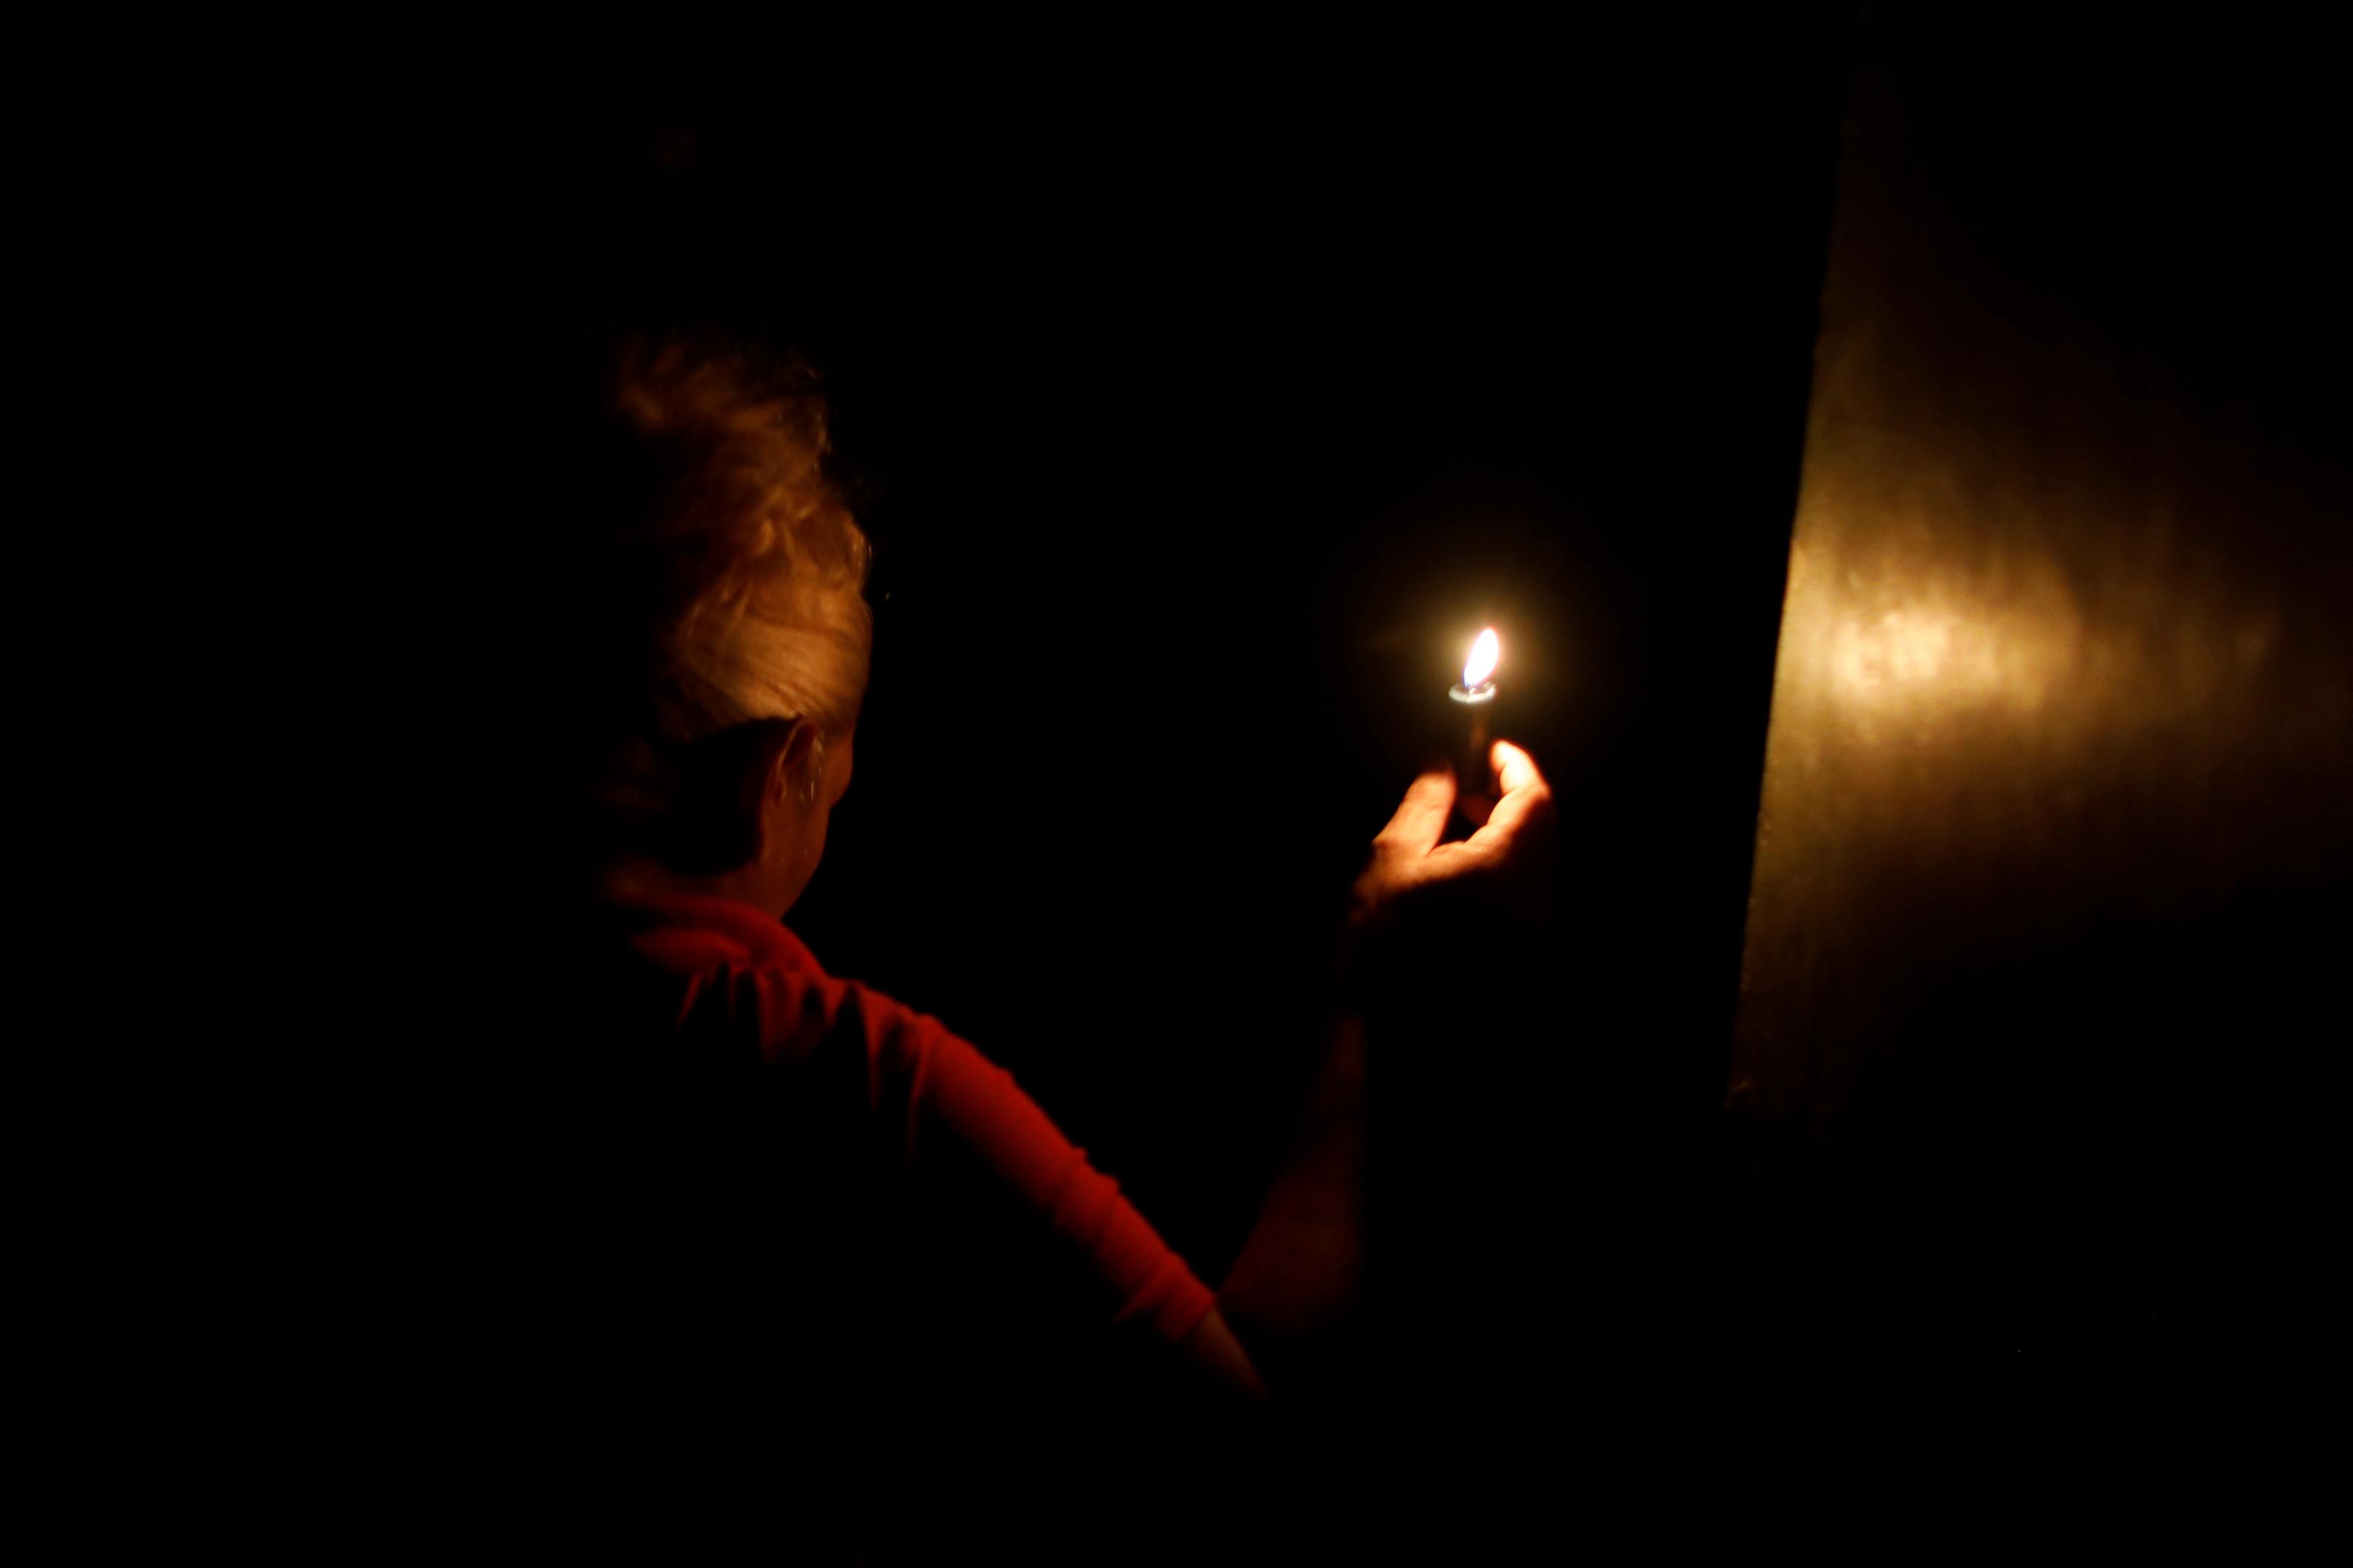 Crise na Venezuela faz blecaute virar rotina em Roraima